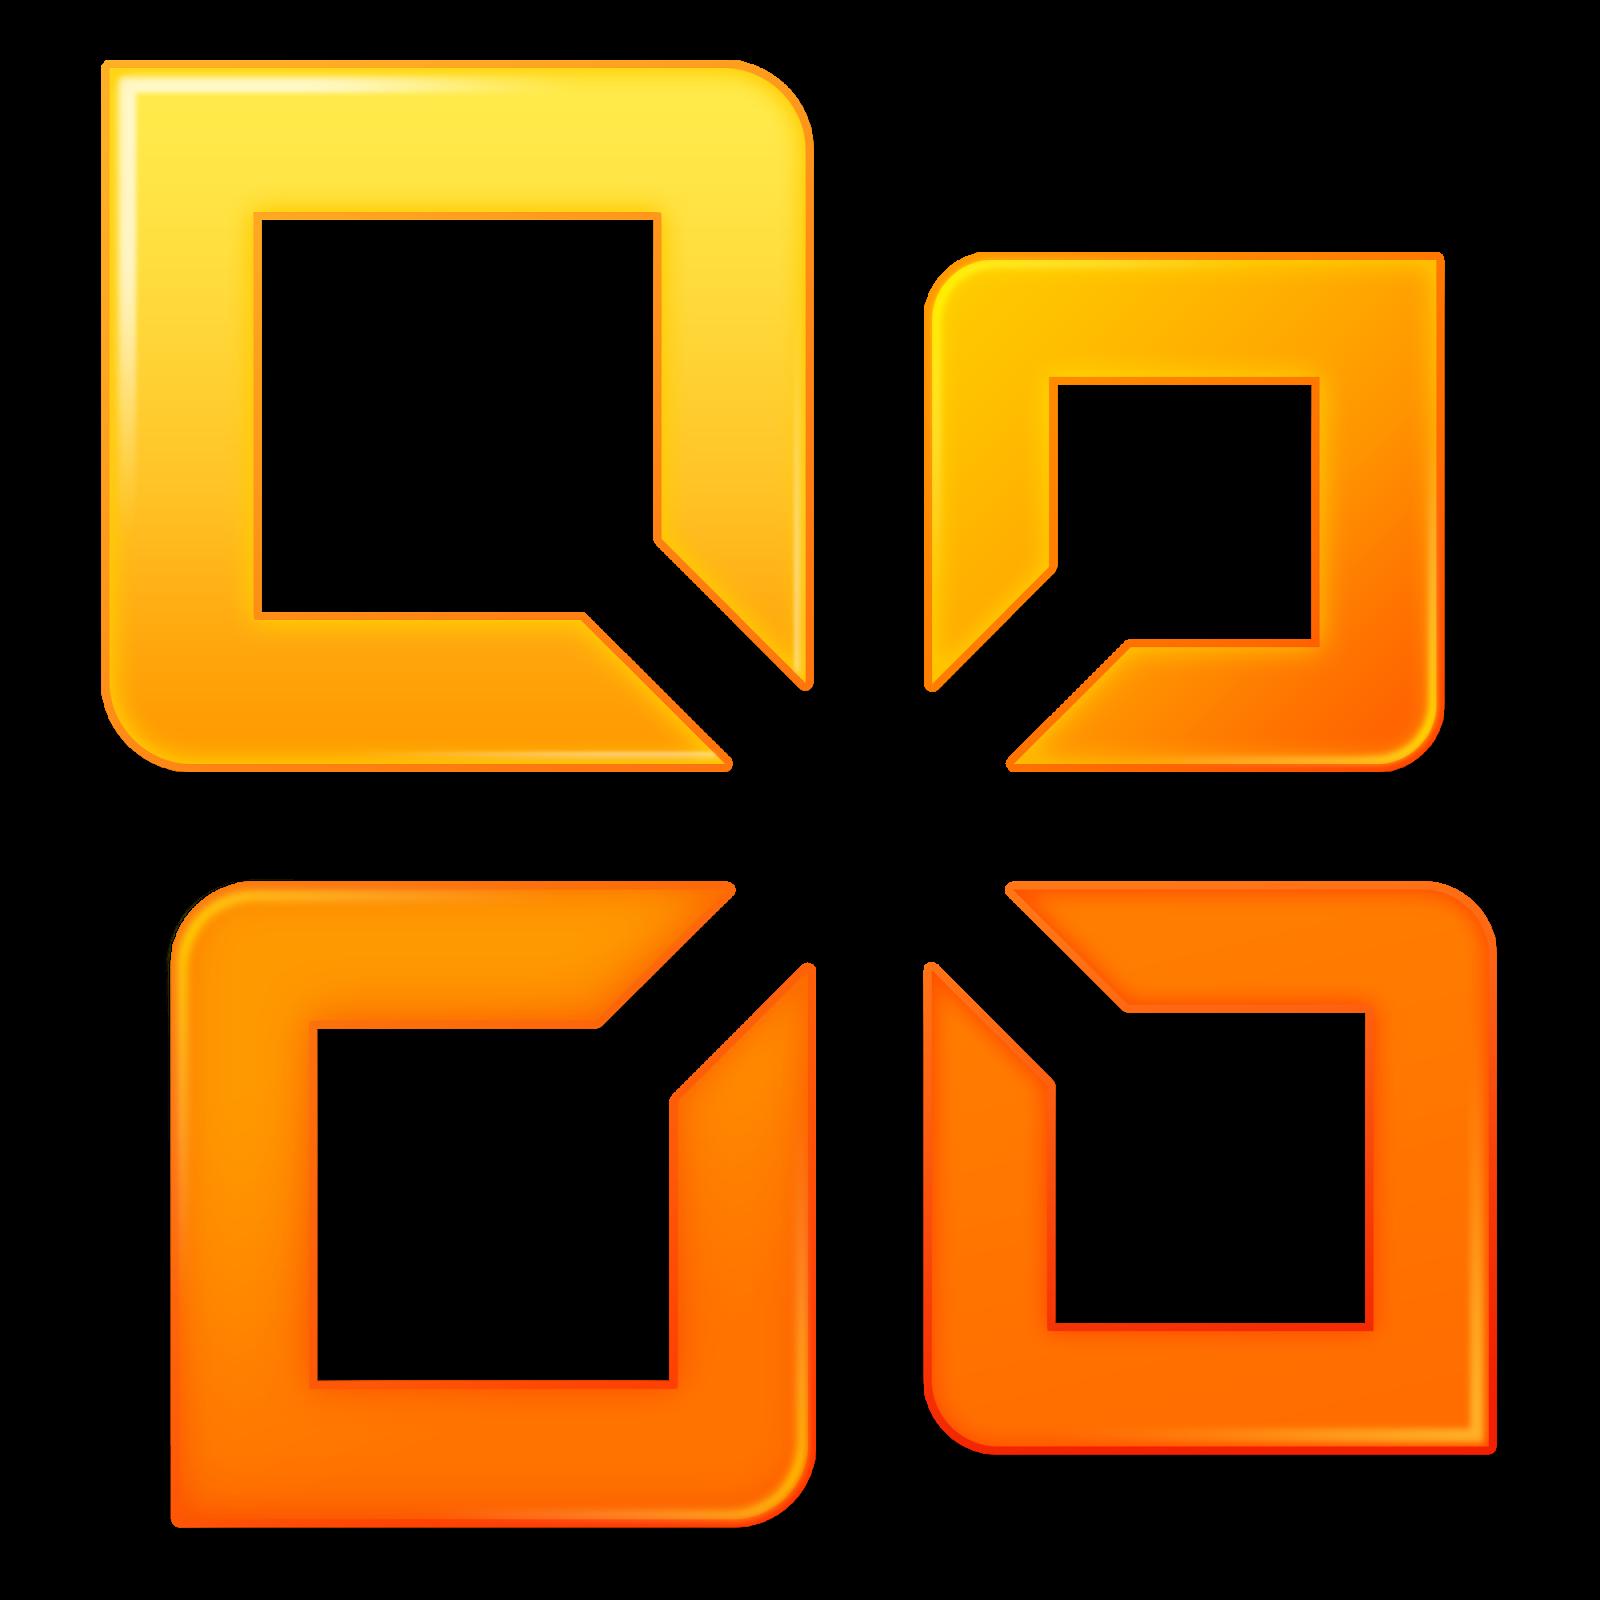 Microsoft Office 2010 SP2 X86/X64 Pro Plus VL MULTi-15